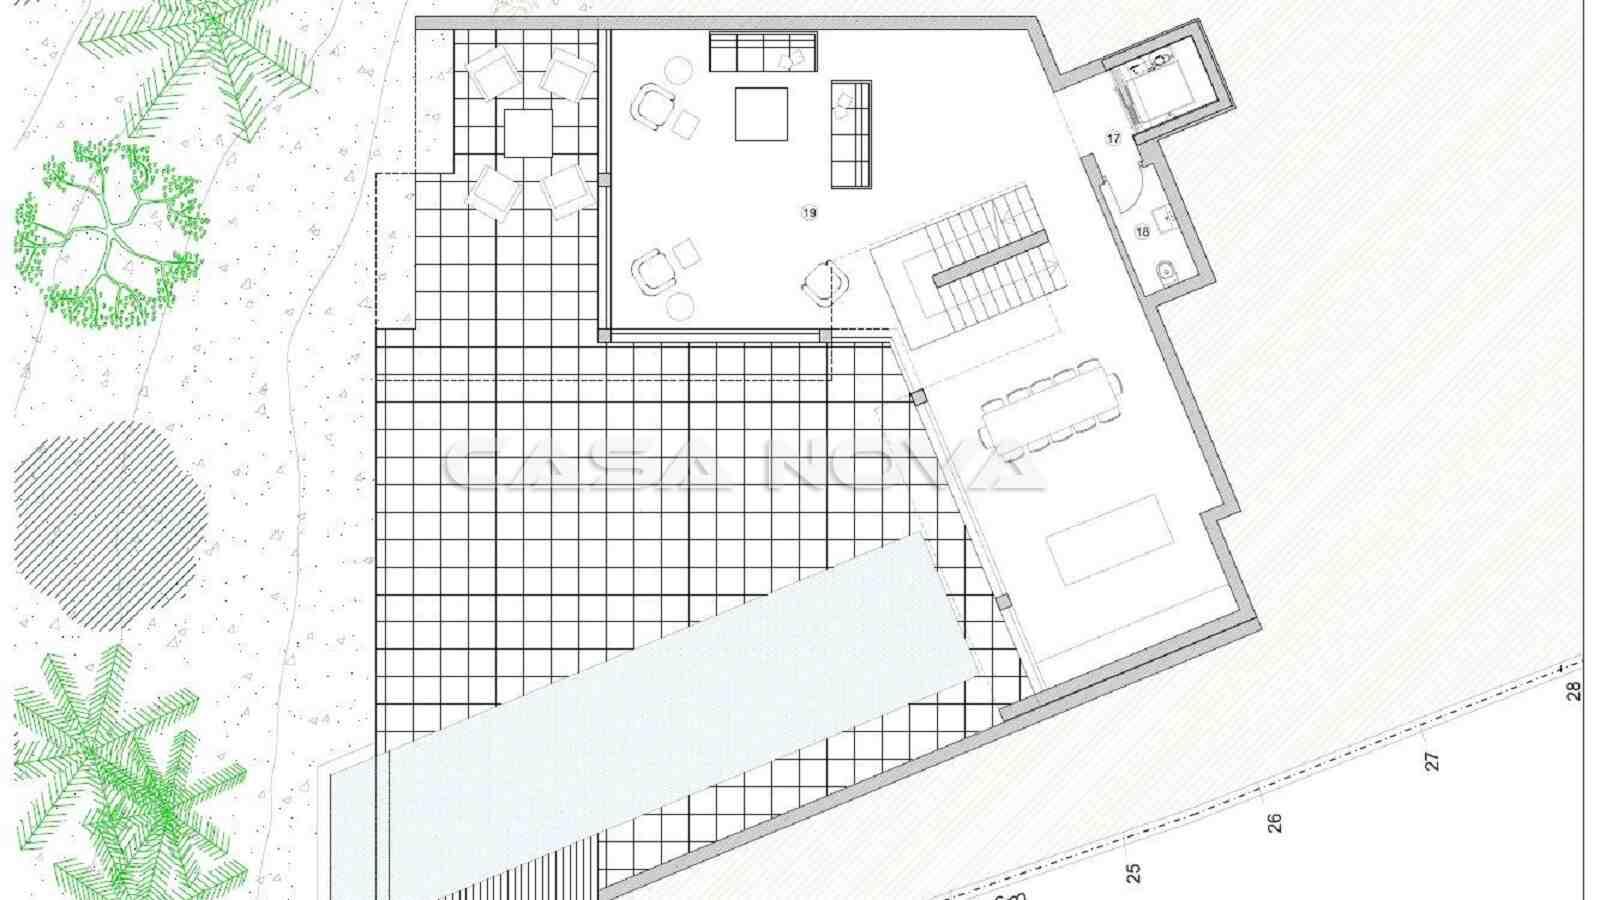 Plan des Ergeschosses der hochwertigen Immobilie